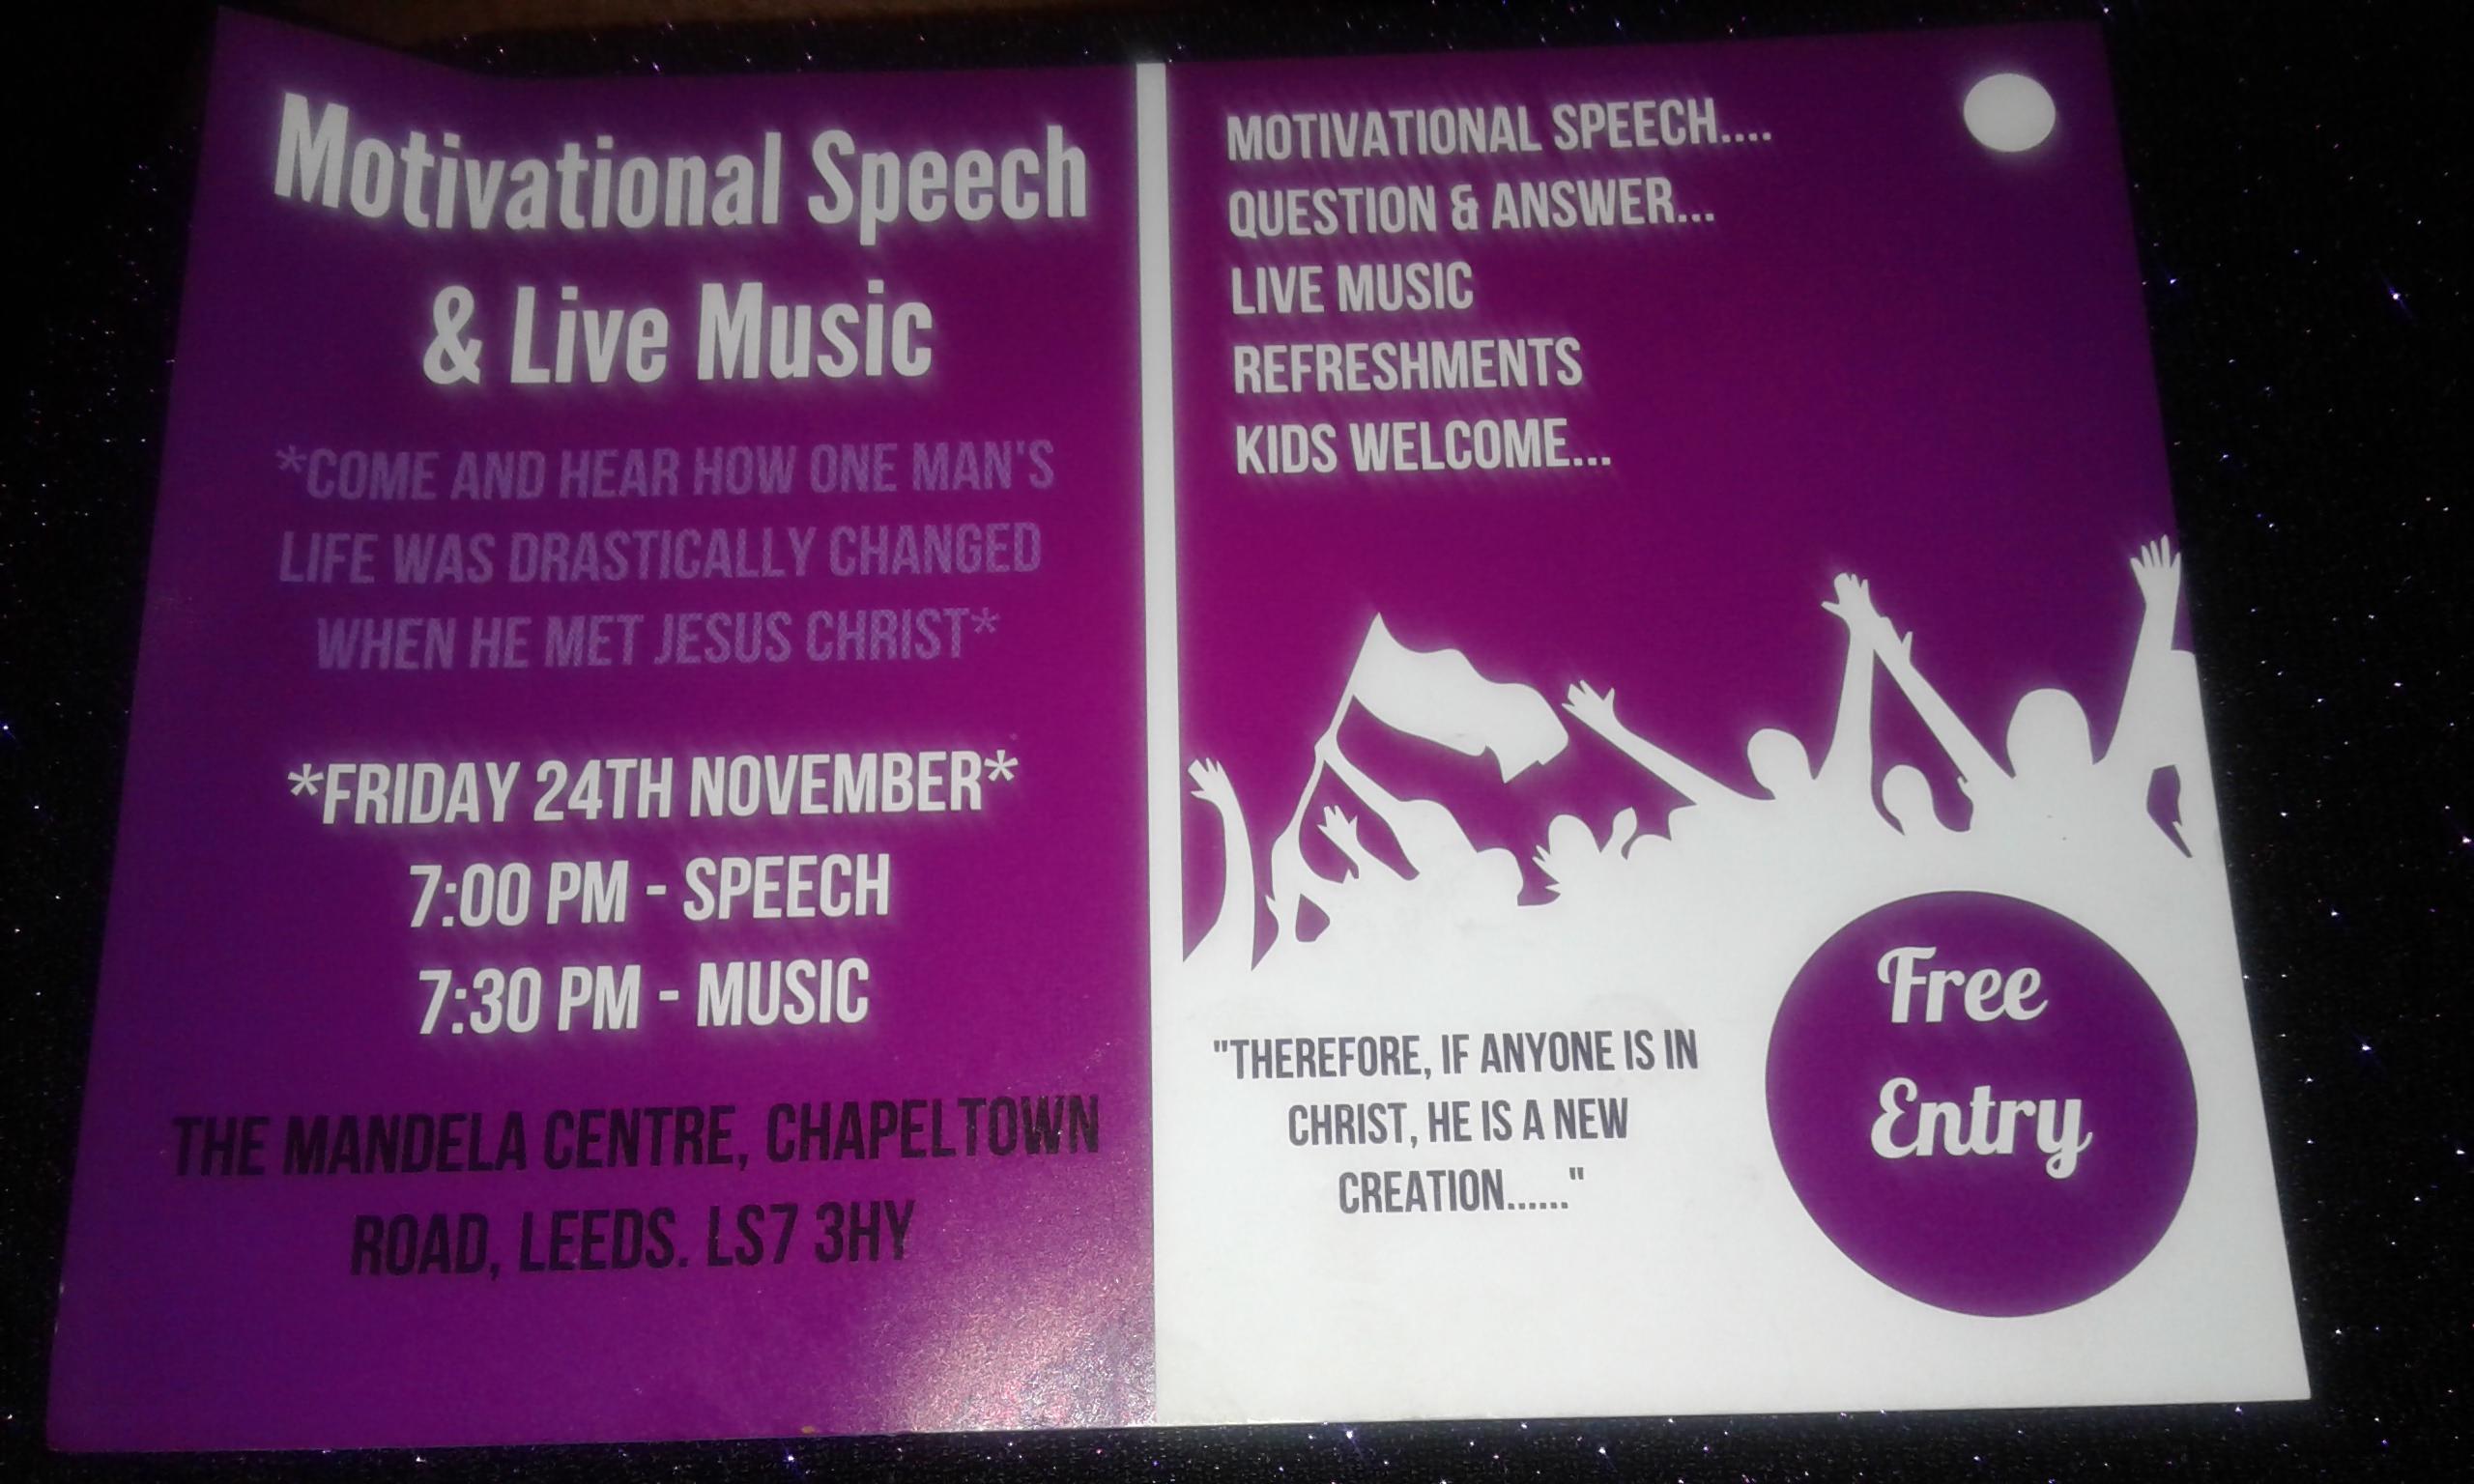 Motivational Speech And Live Music - Community Highlights Leeds